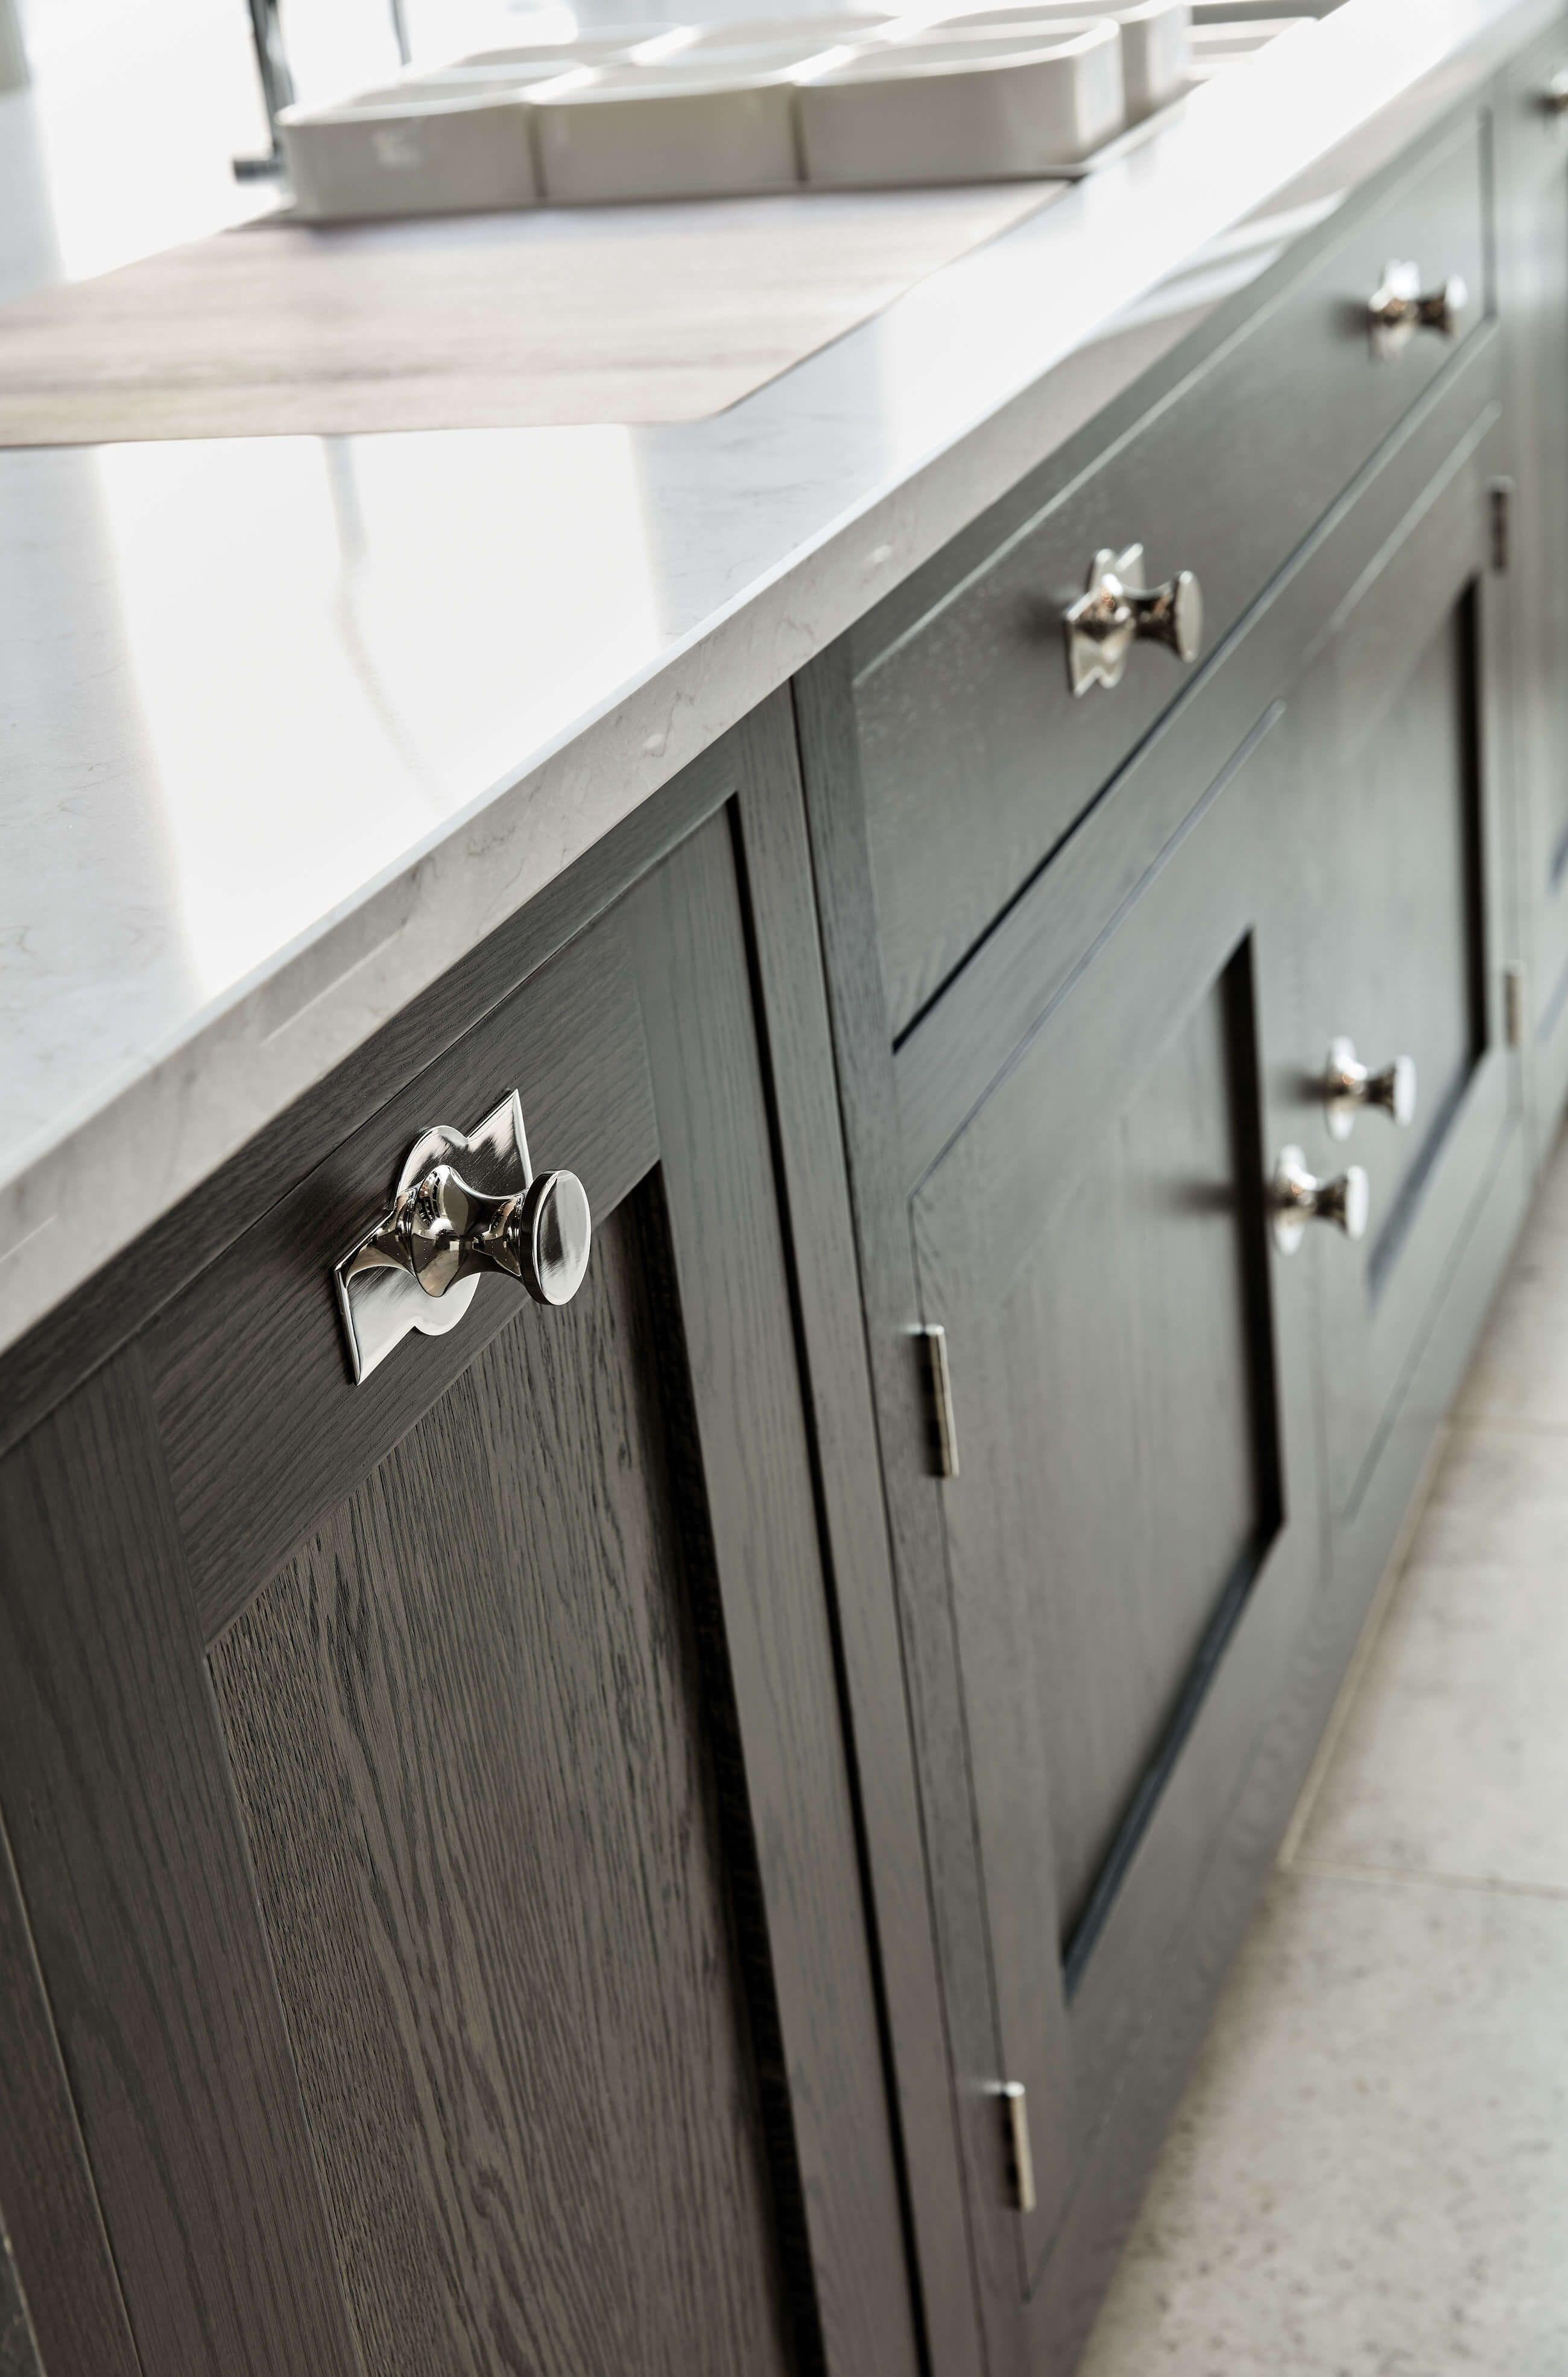 Maniglie Per Cucina Maniglie Per Cucina Honey Oak Cabinets Kitchen Cupboard Handles Cupboard Handles